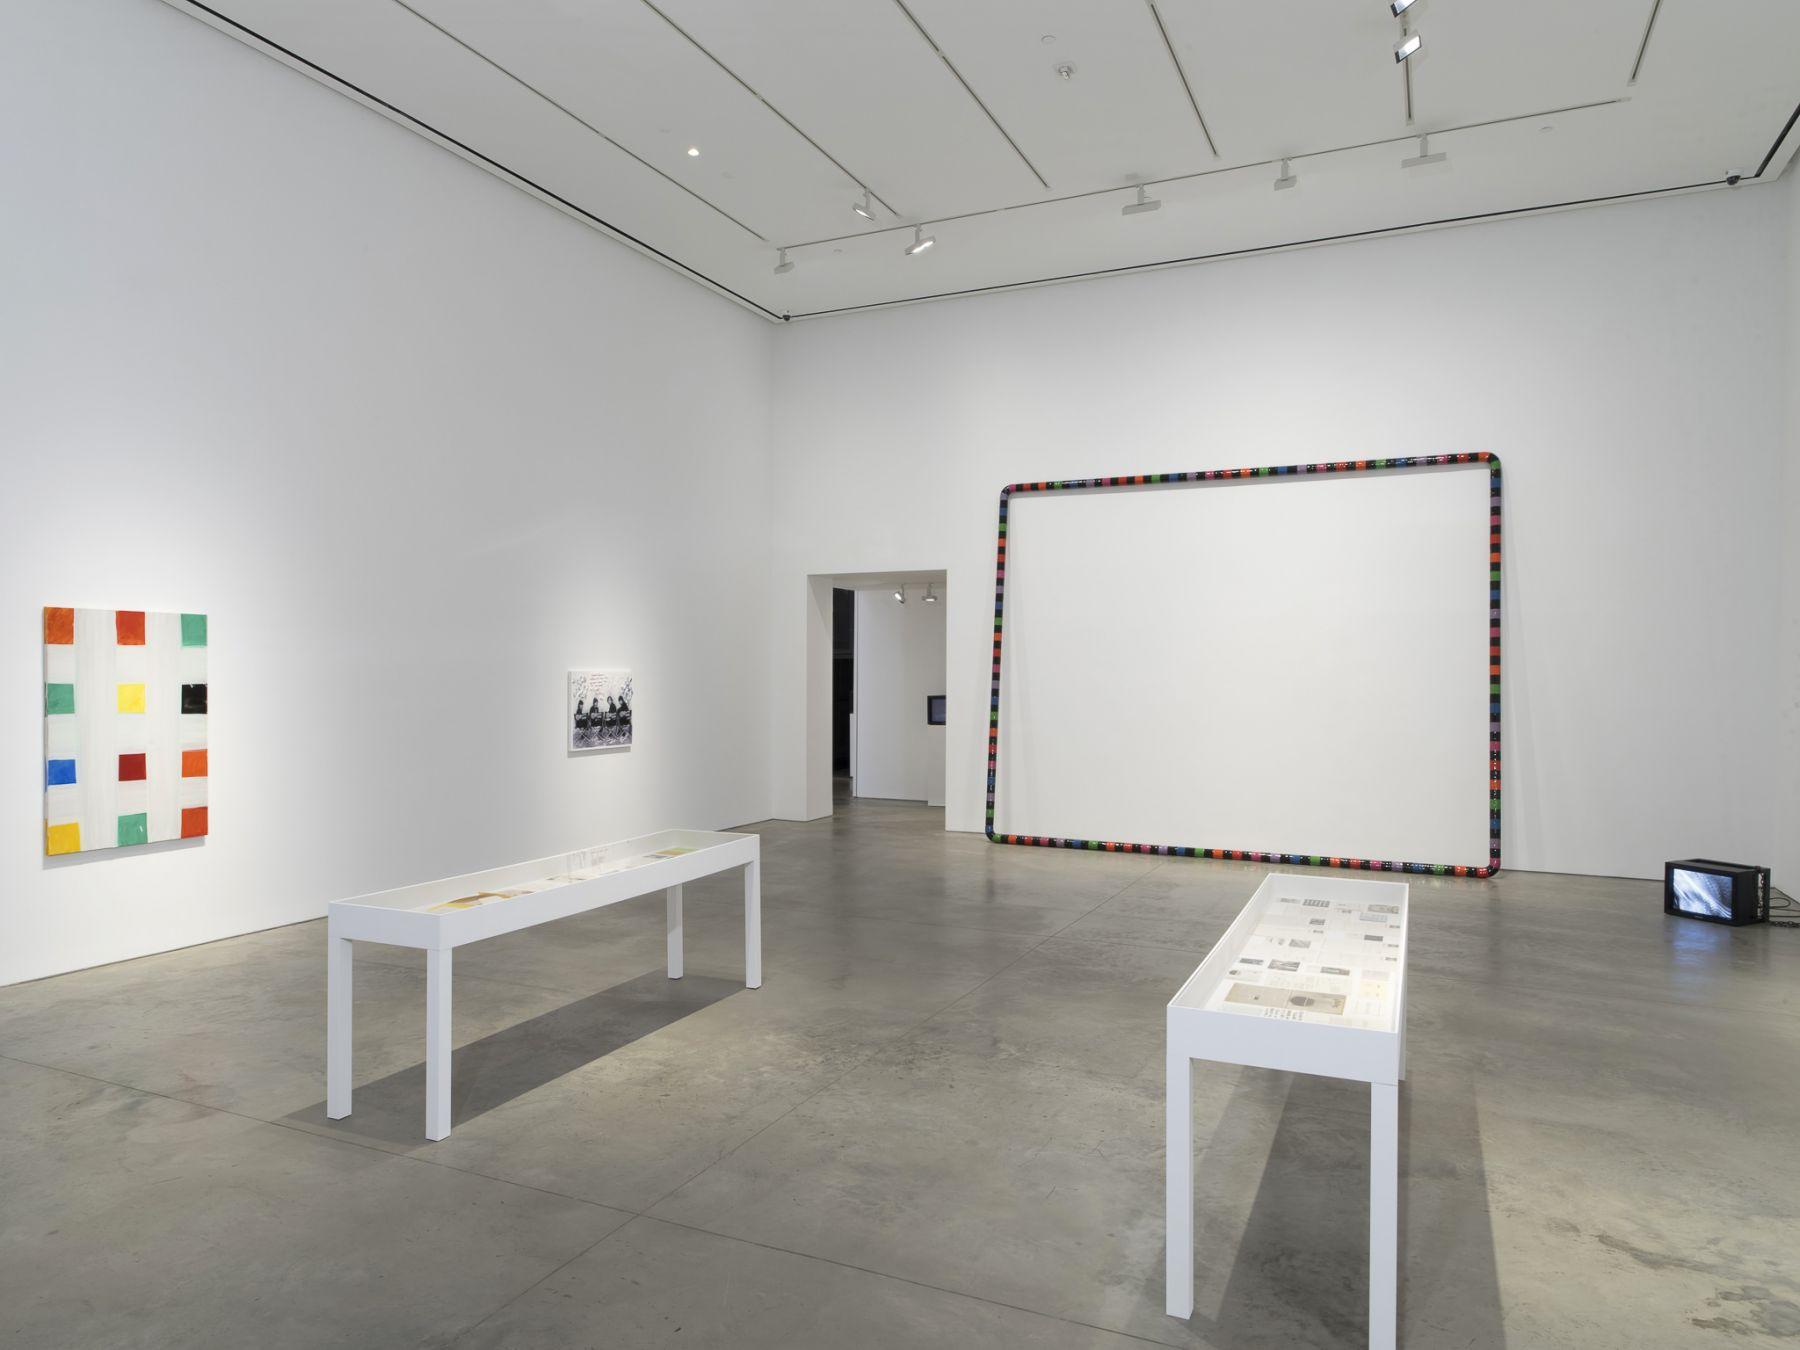 Installation view:303 Gallery: 35 Years, 303 Gallery, New York, NY, Photo: John Berens